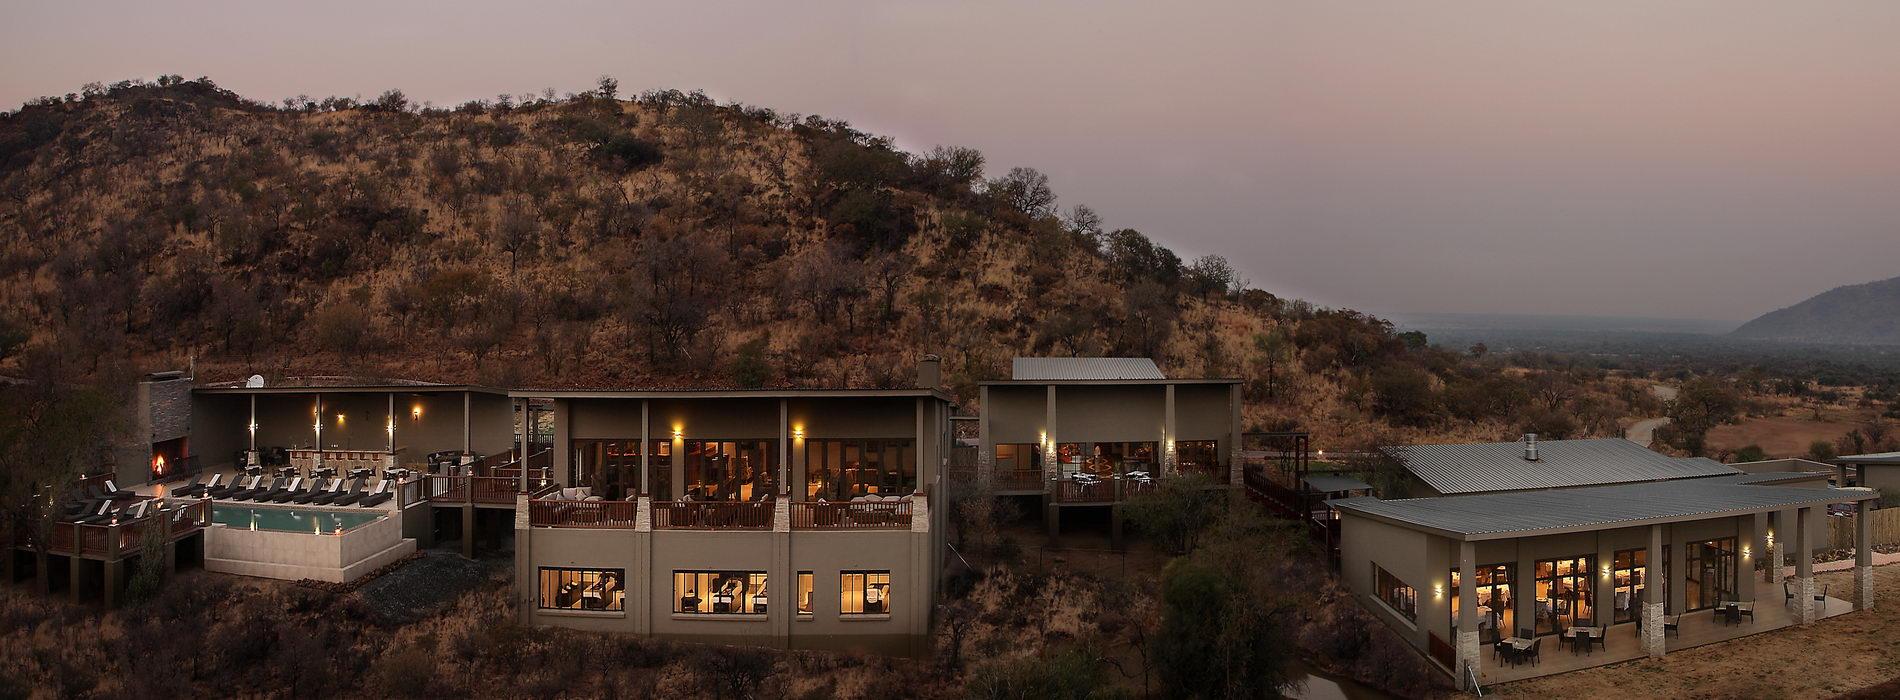 Shepherds Tree Lodge